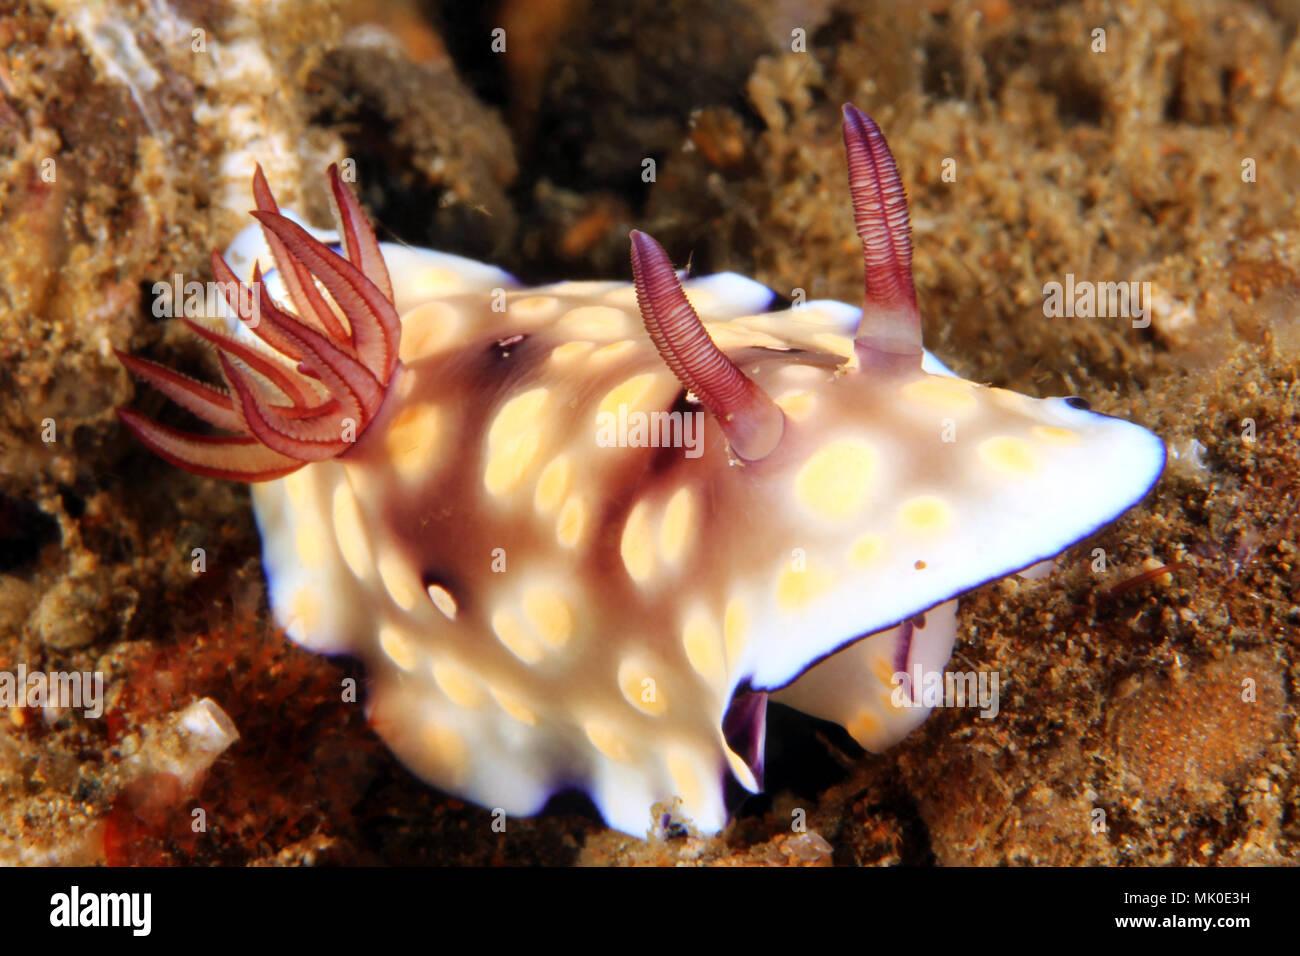 Goniobranchus Hintuanensis Nudibranch (Chromodoris hintuanensis). Anilao, Philippines - Stock Image